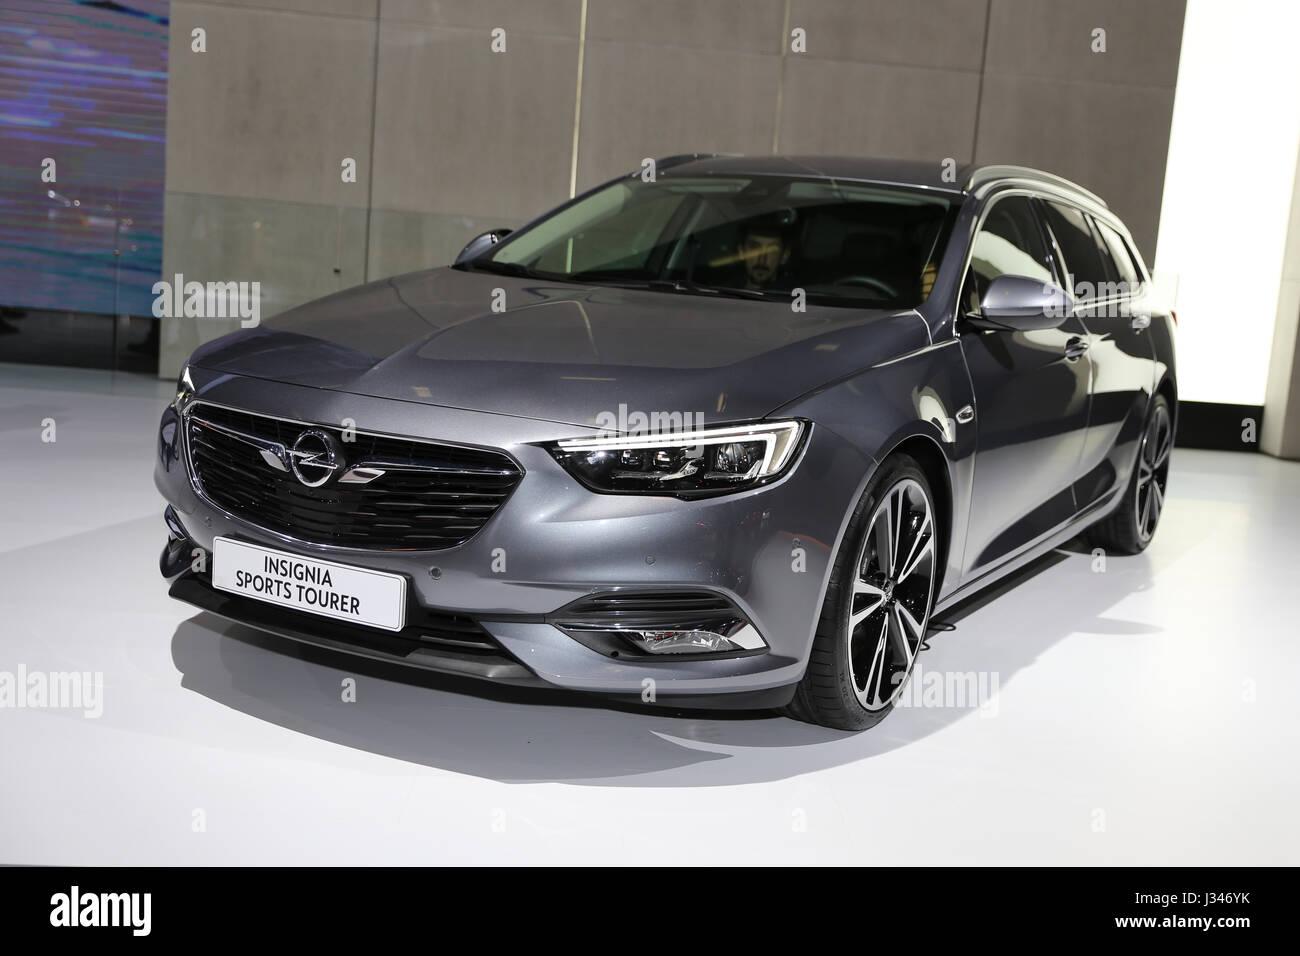 Istanbul Turkey April 22 2017 Opel Insignia Sports Tourer On Stock Photo Alamy